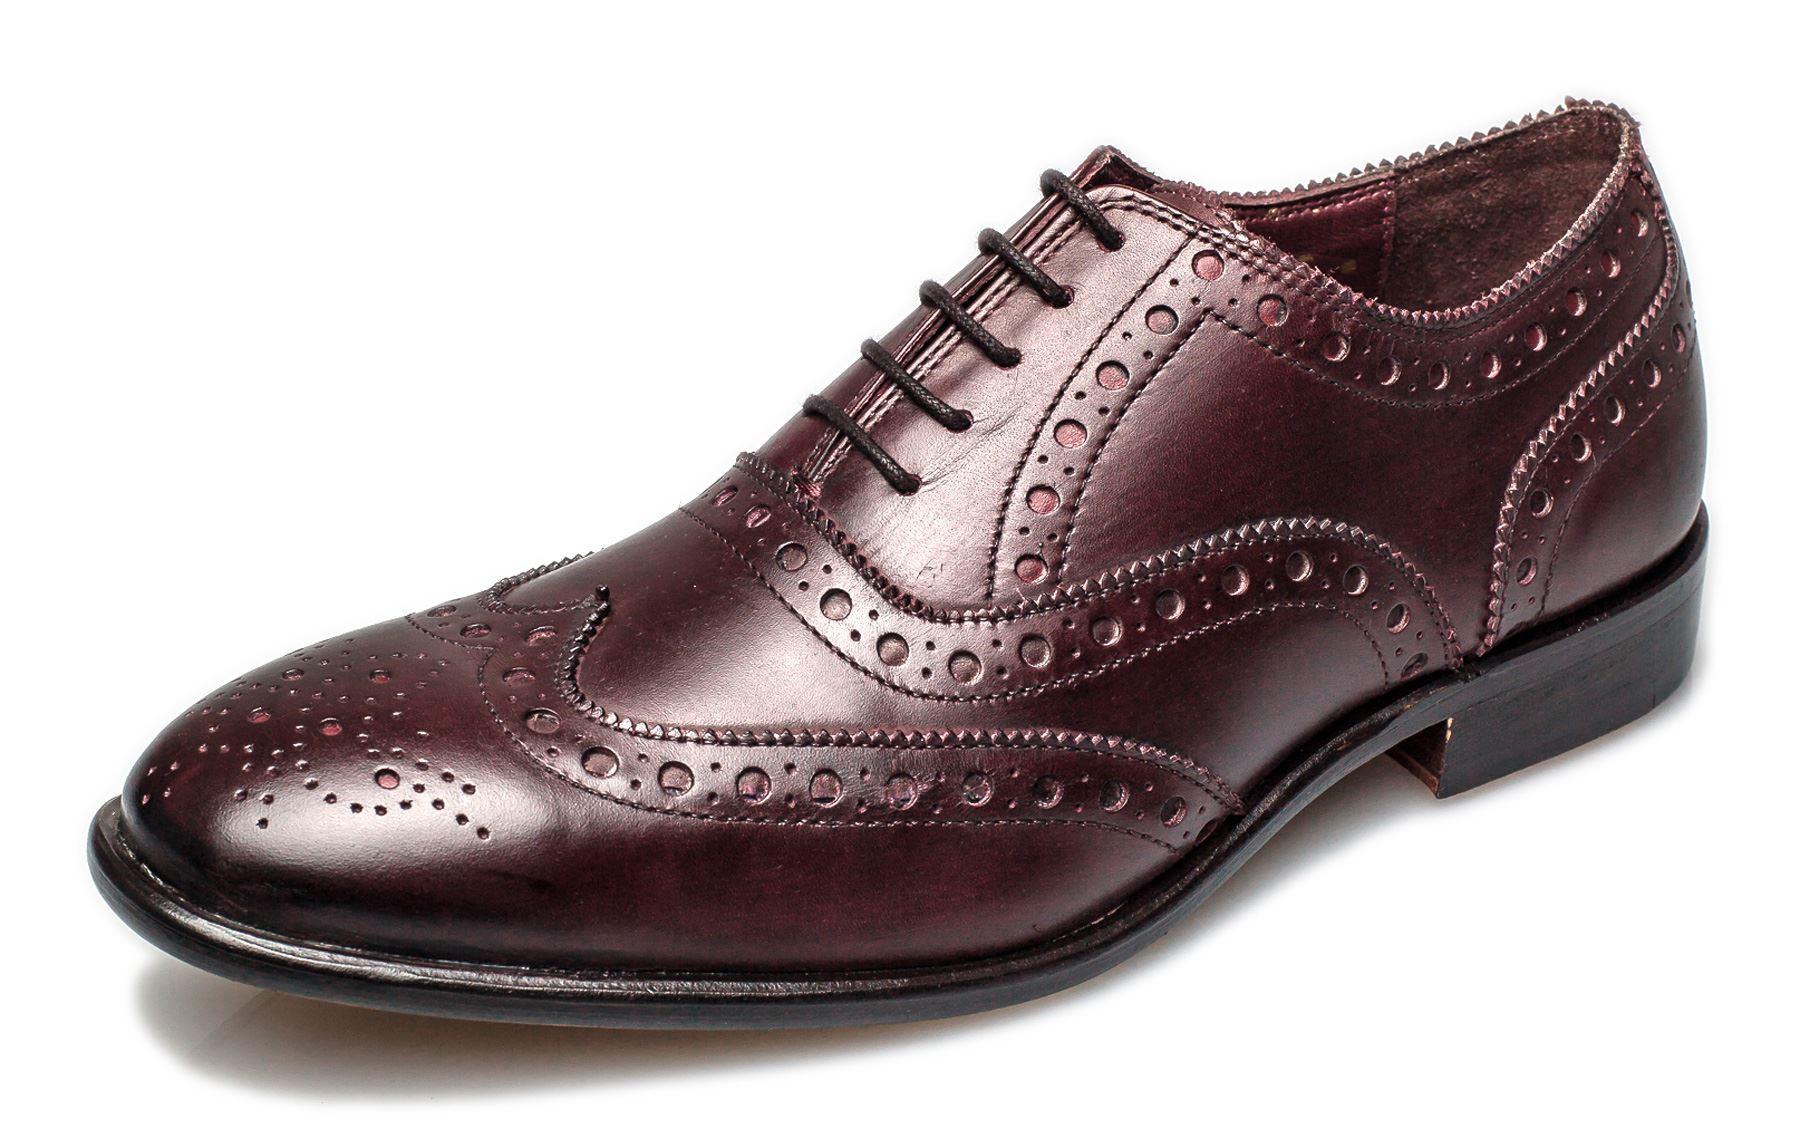 London Brogues Mens Leather Sole Bucanon Brogue Oxford Shoes | EBay